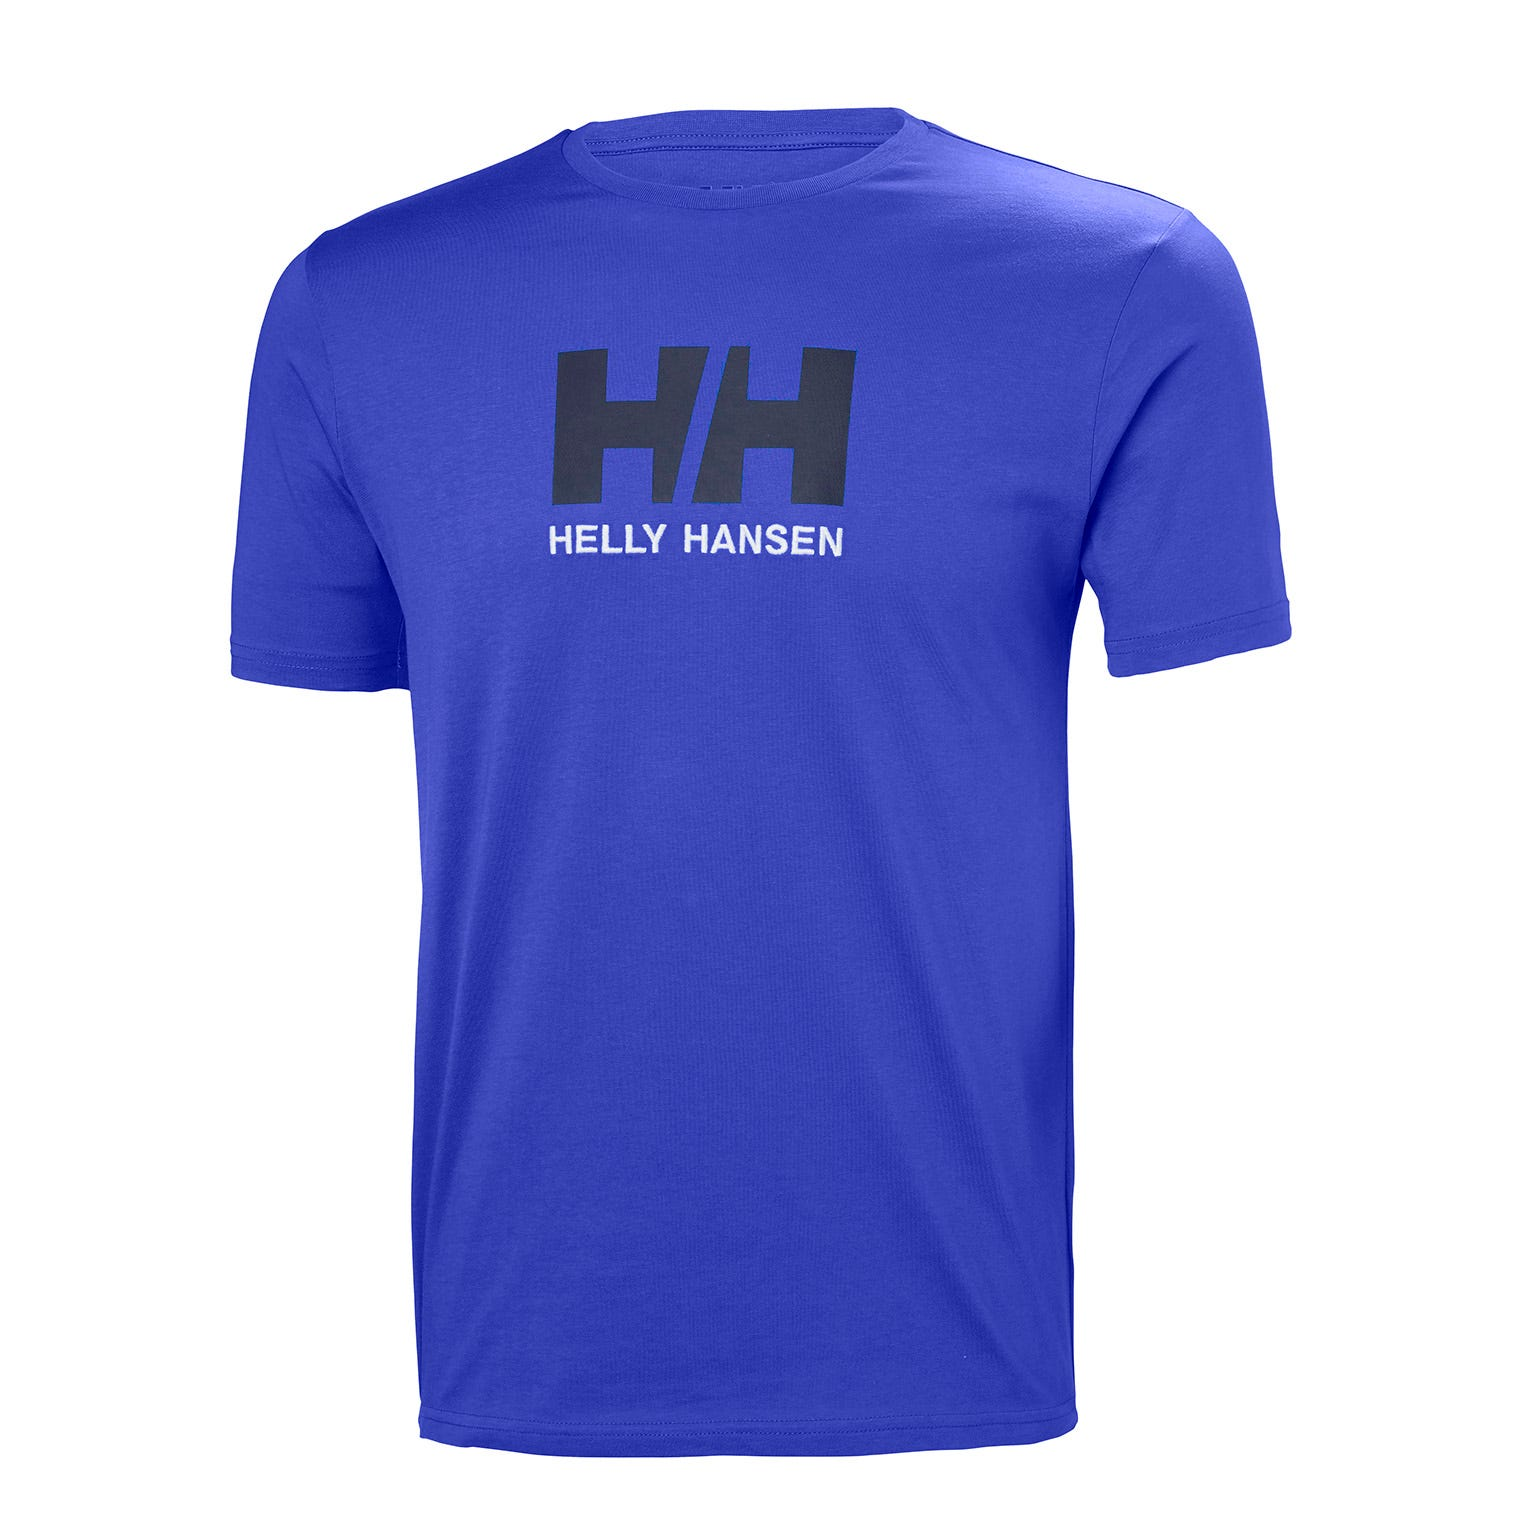 Helly Hansen Mens Hh Logo Tshirt Blue M